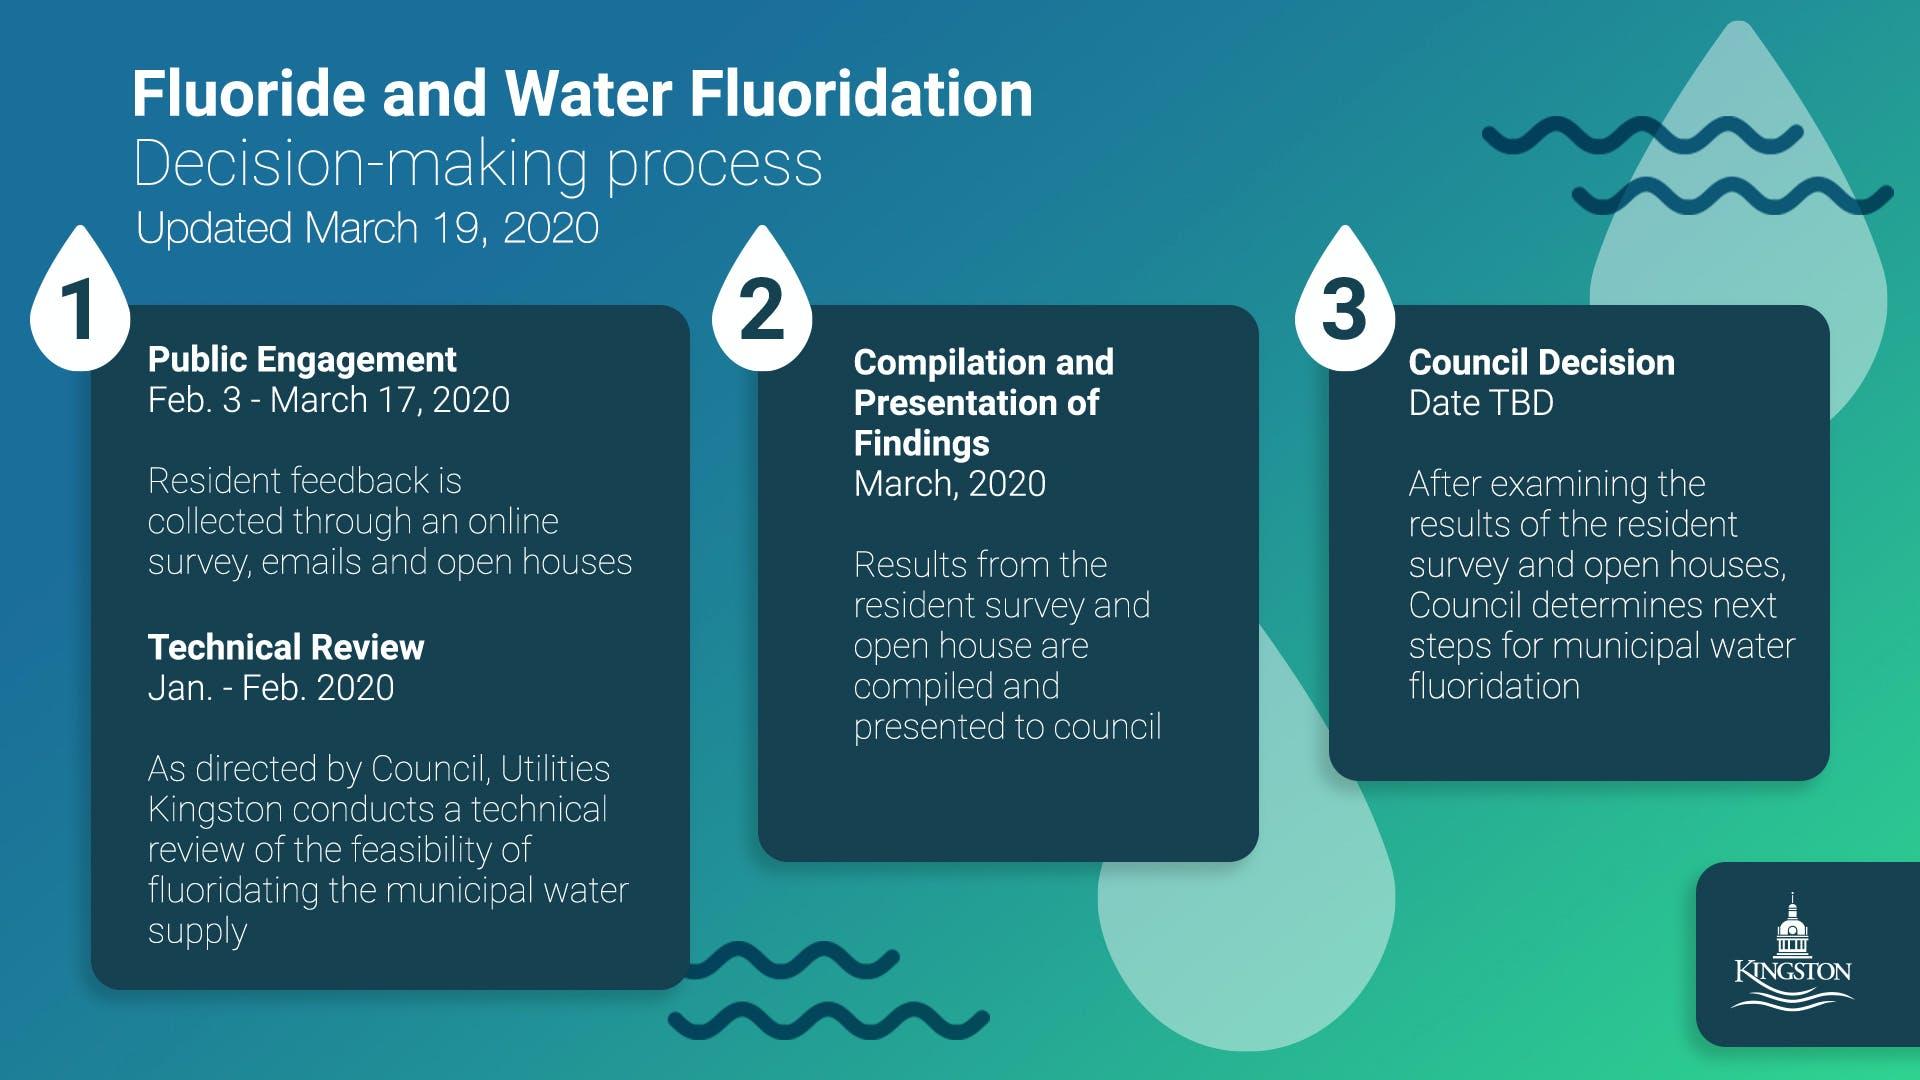 04-03-20-Fluoride-Decision-making-r3.jpg